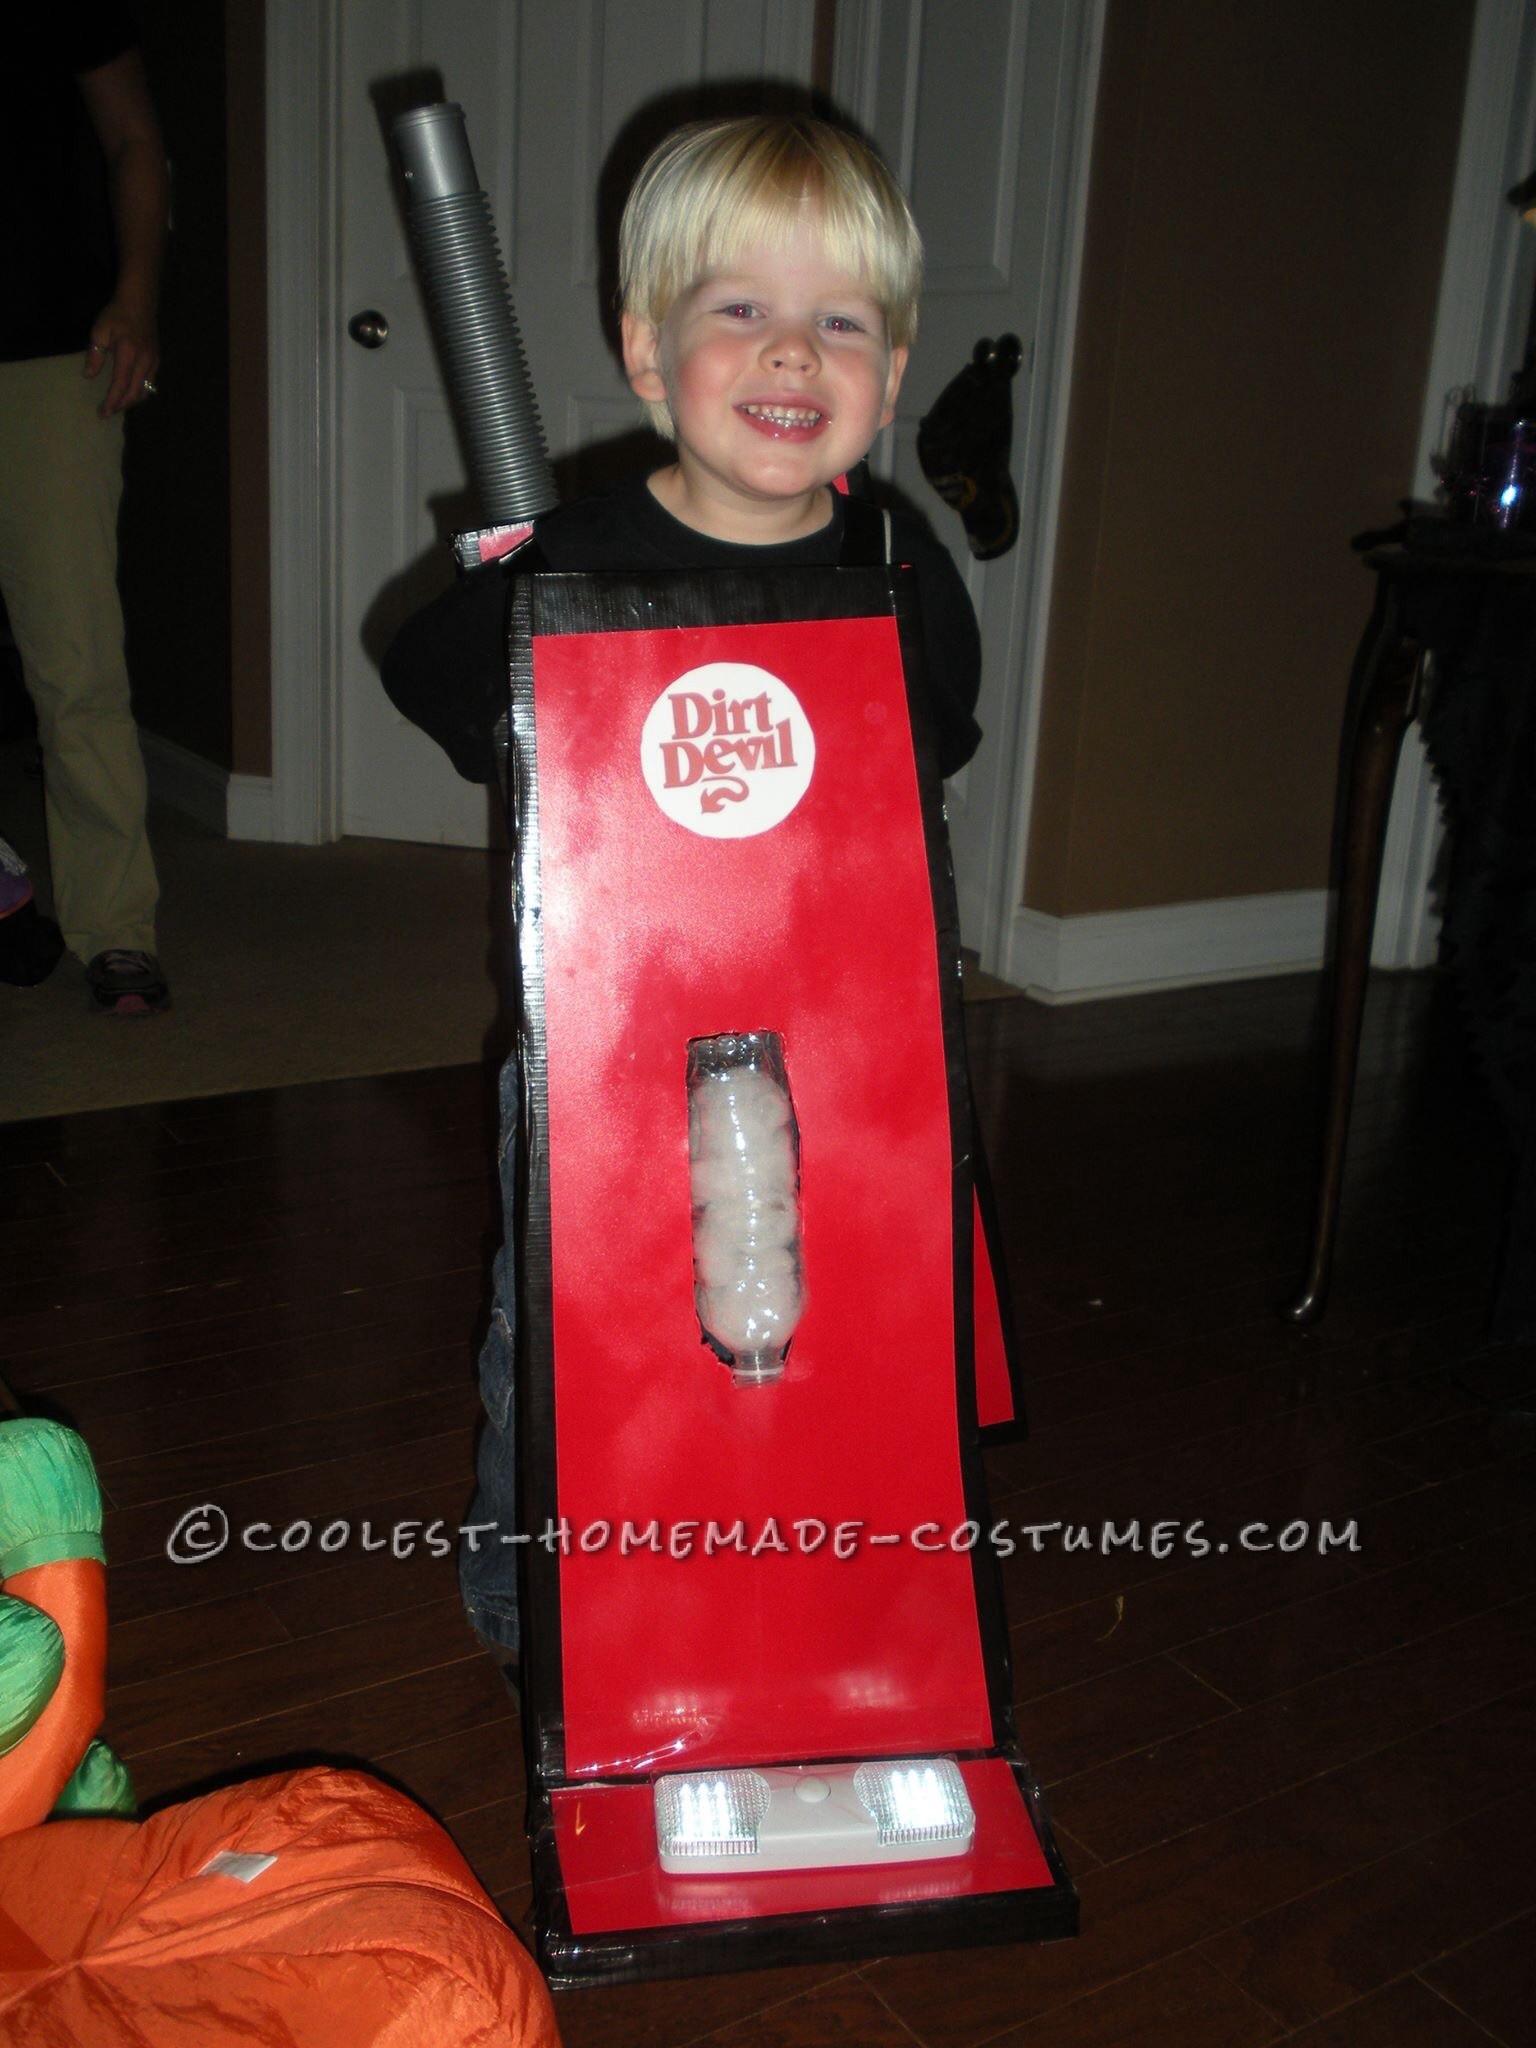 Cutest Little Dirt Devill Vacuum Costume for a Boy